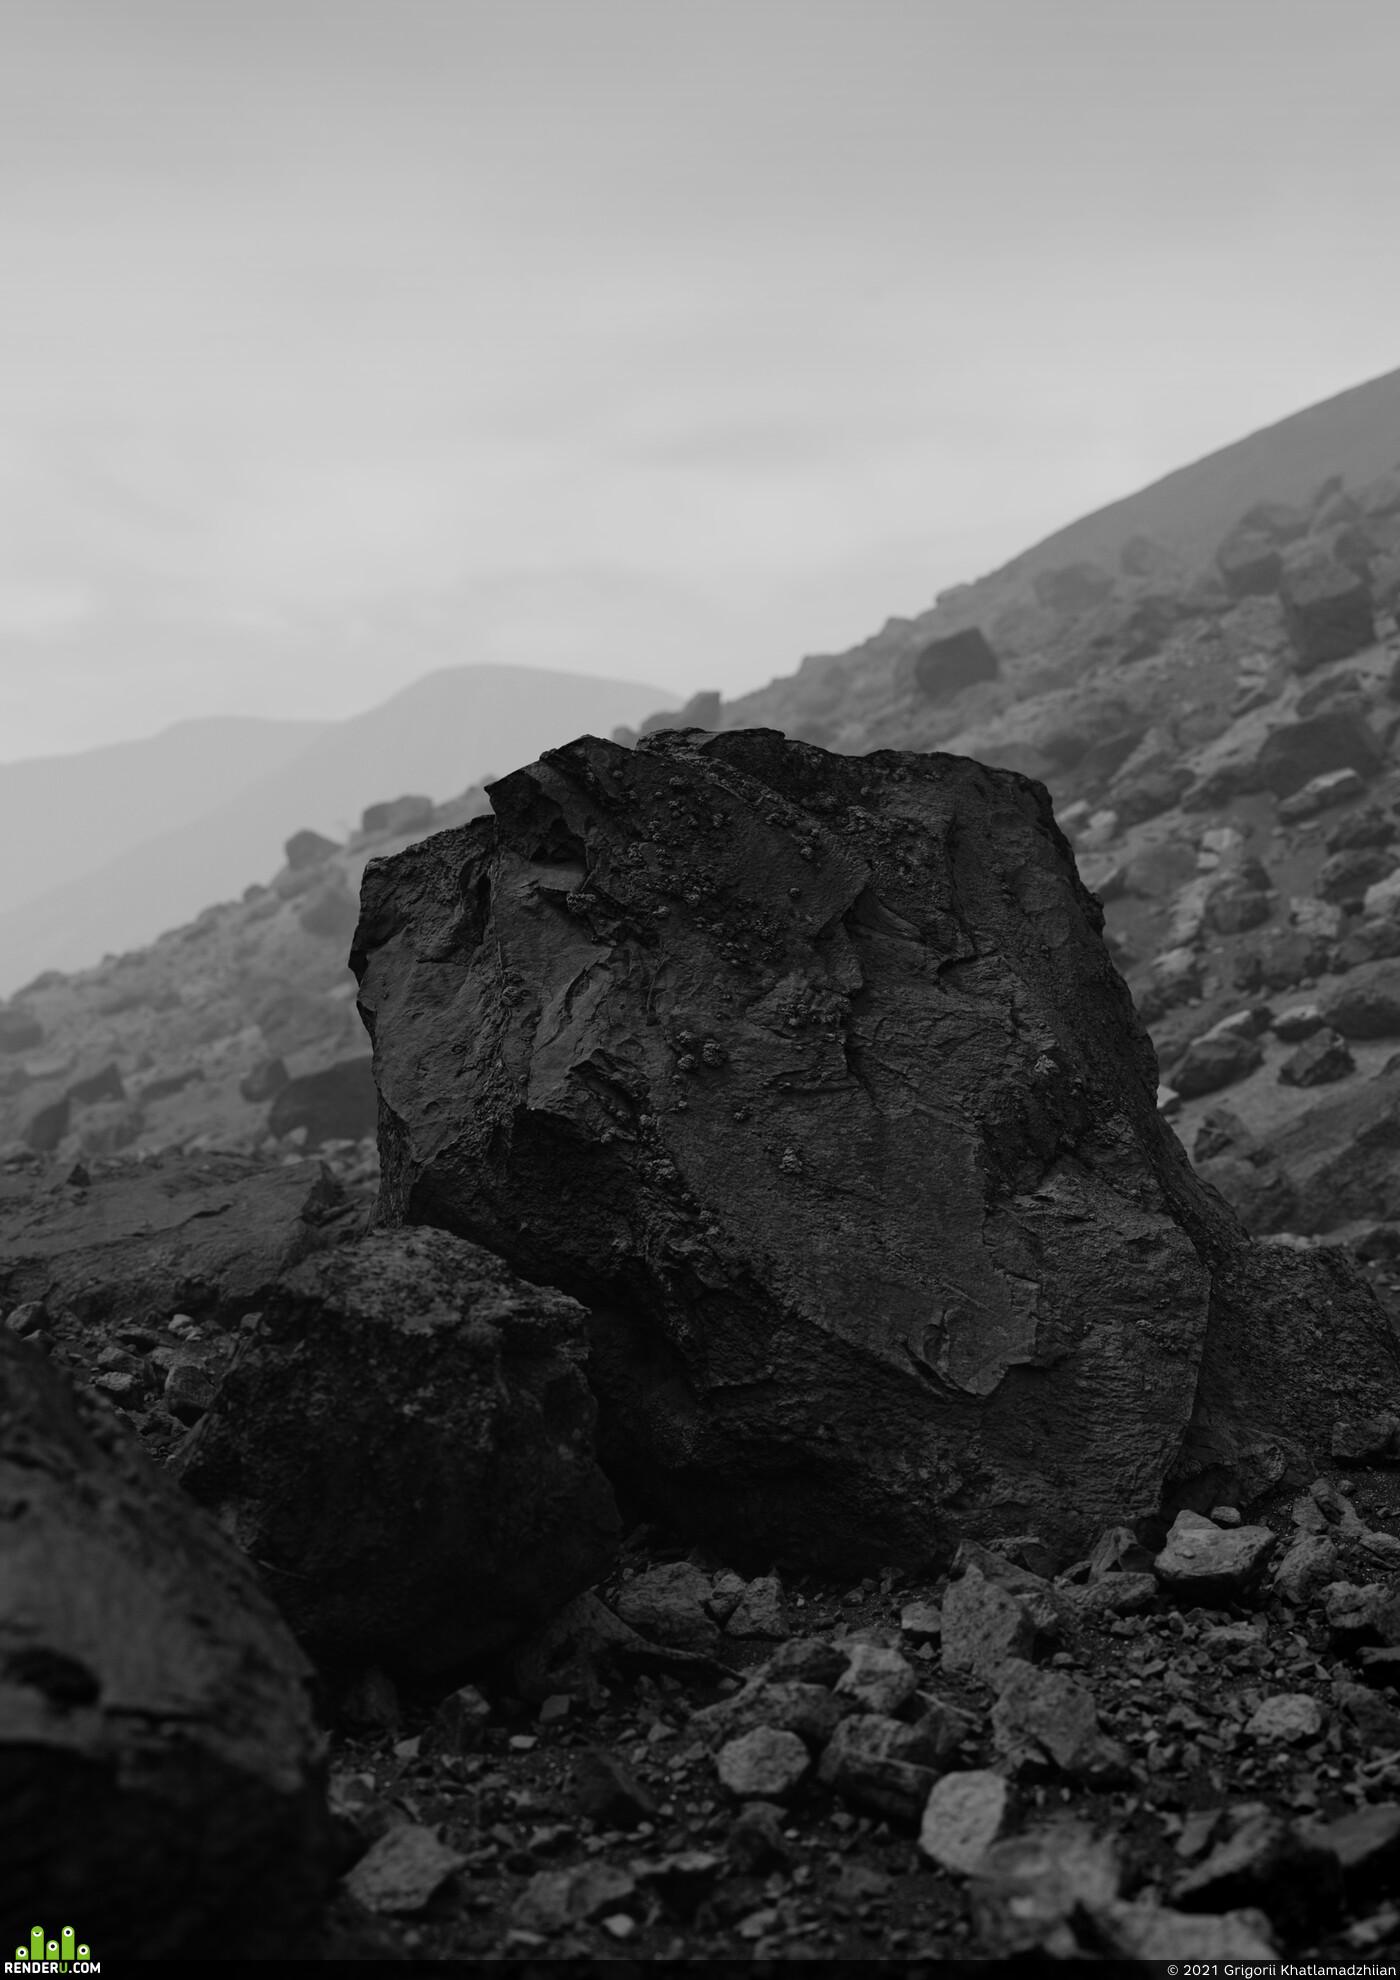 Компьютерная графика/CG, art, quixel megascans, Corona Renderer, 3Dsmax, world creator 2, Landscapes, rocks, the mountains, Industrial